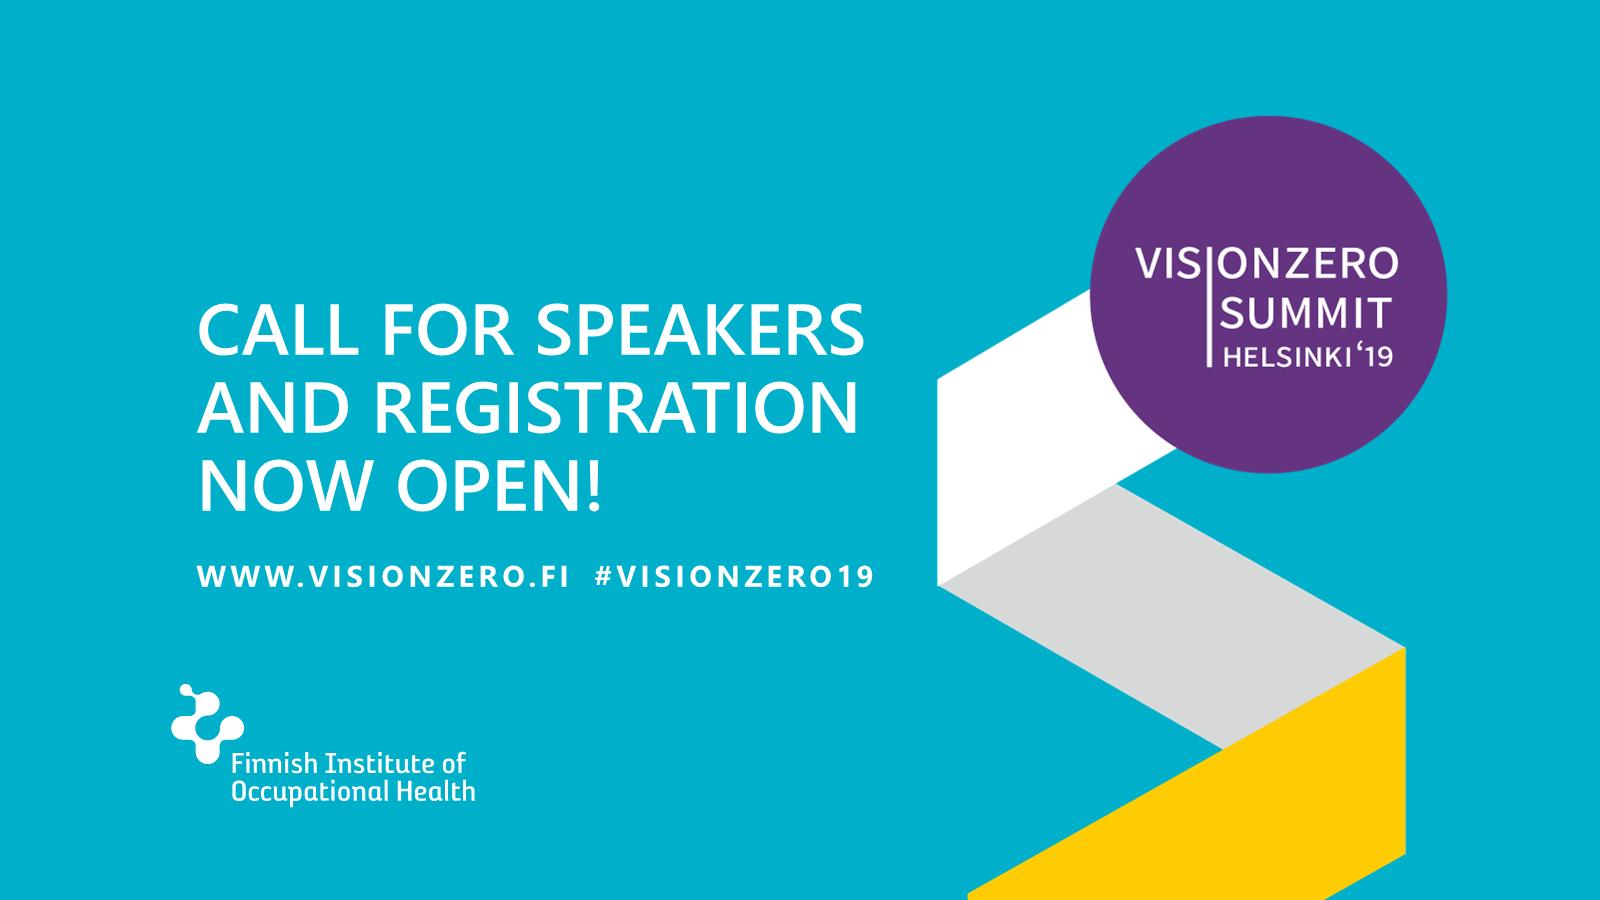 Vision Zero Summit 2019